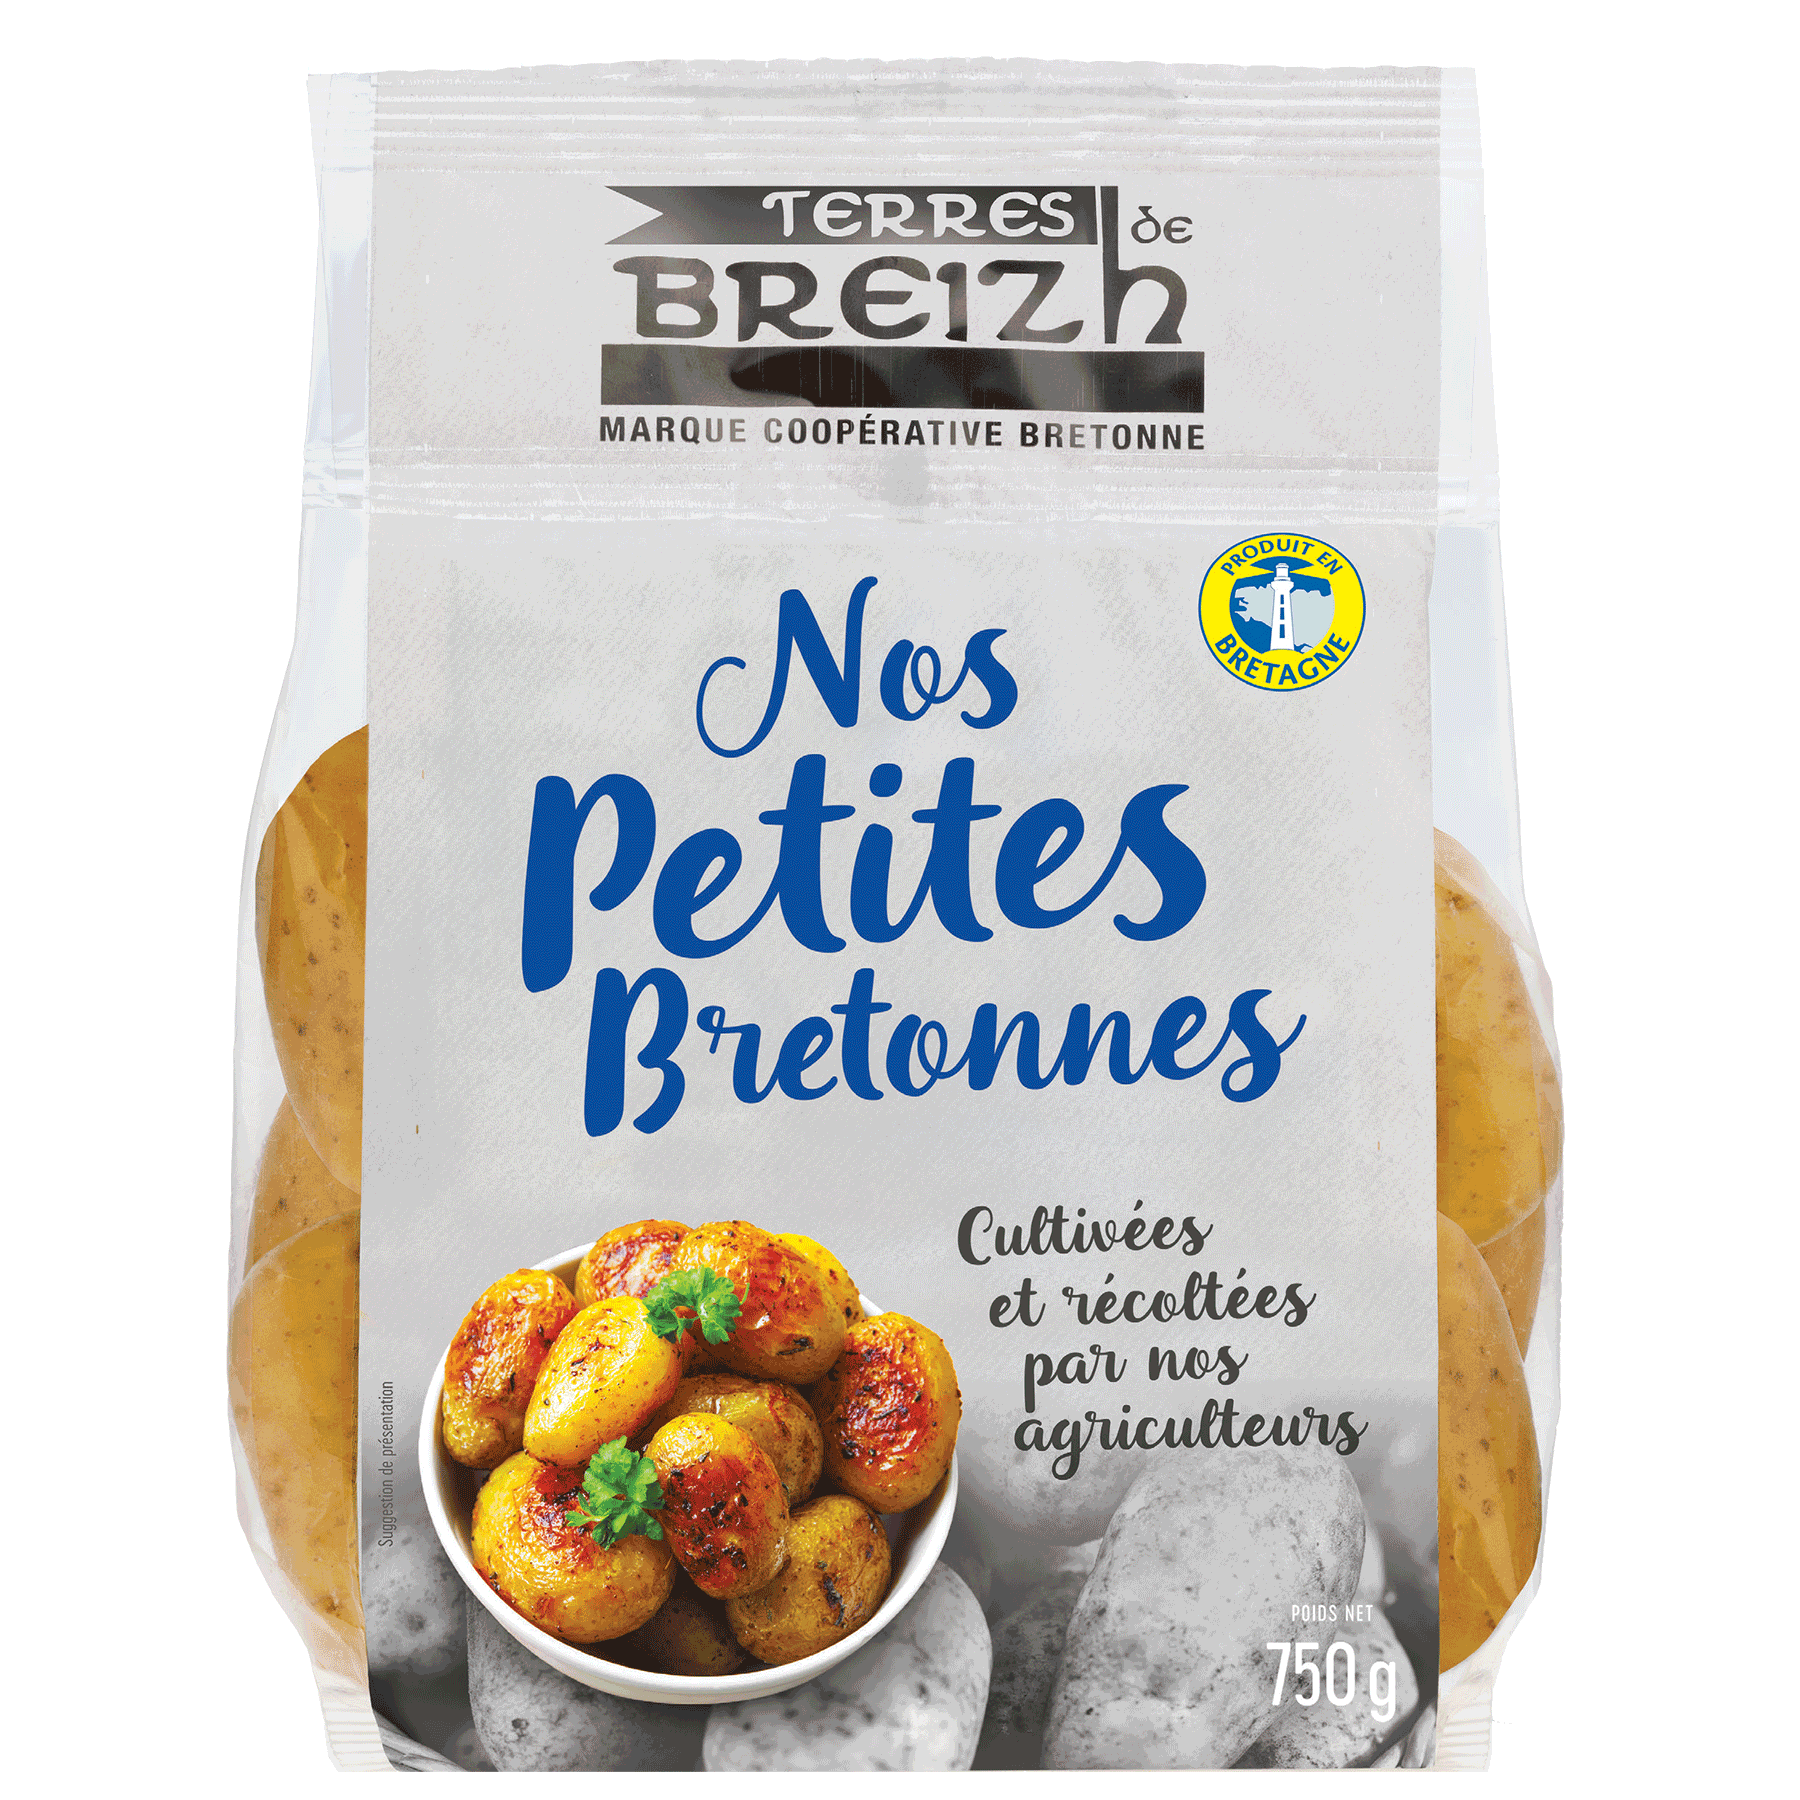 Nos-petites-bretonnes-terres-de-breizh